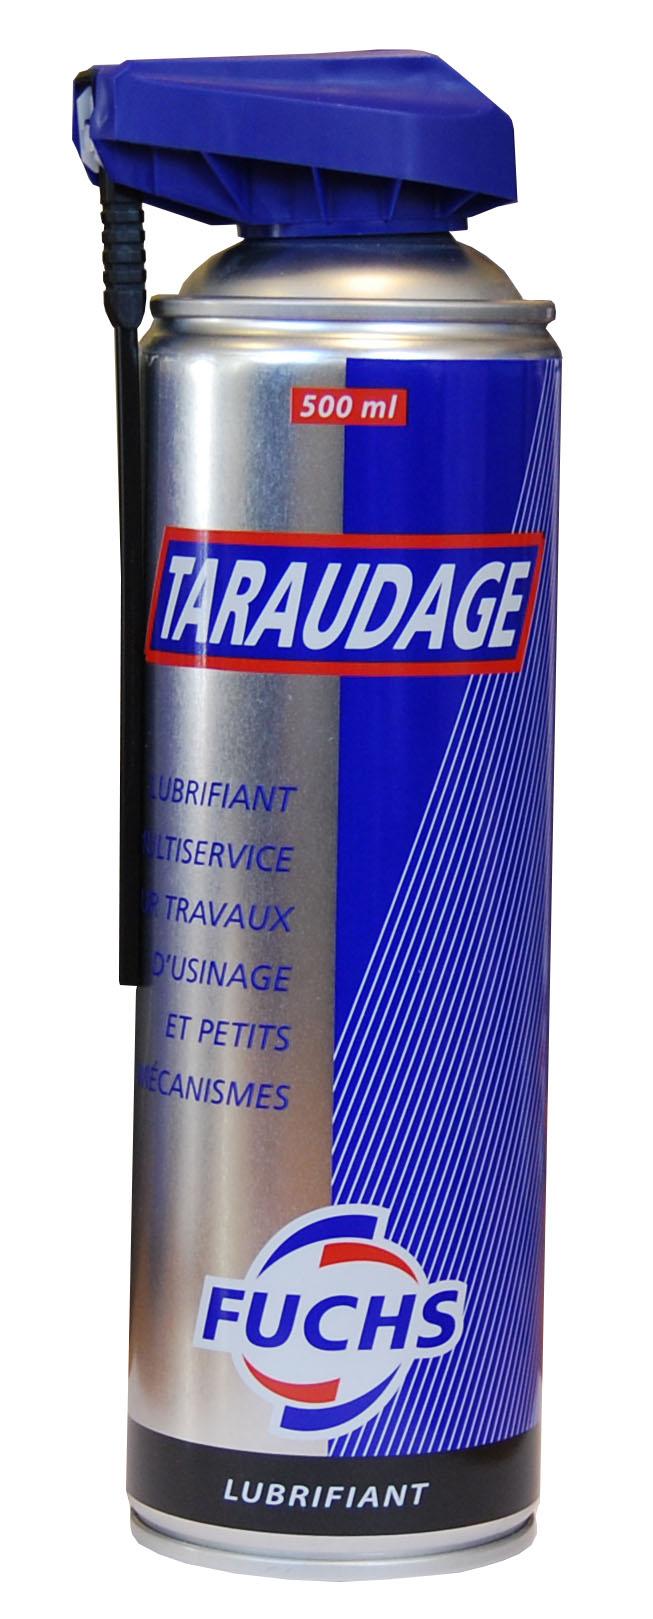 FUCHS LUBRIFIANT - AEROSOL TARAUDAGE